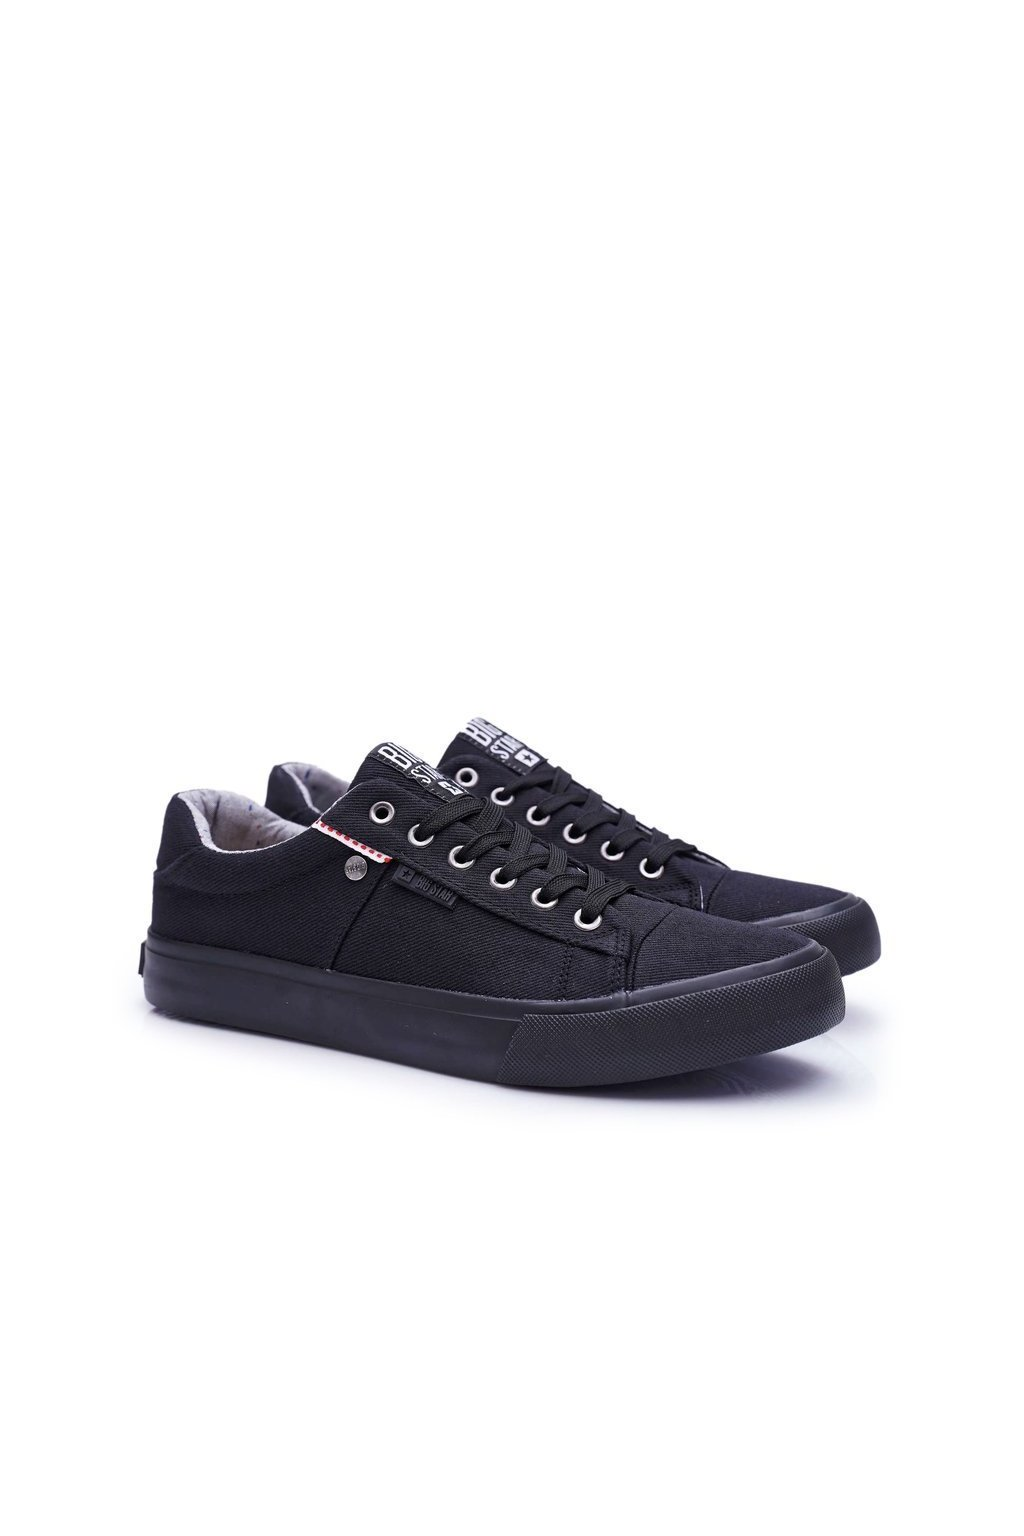 Čierna obuv kód topánok AA174096 BLK